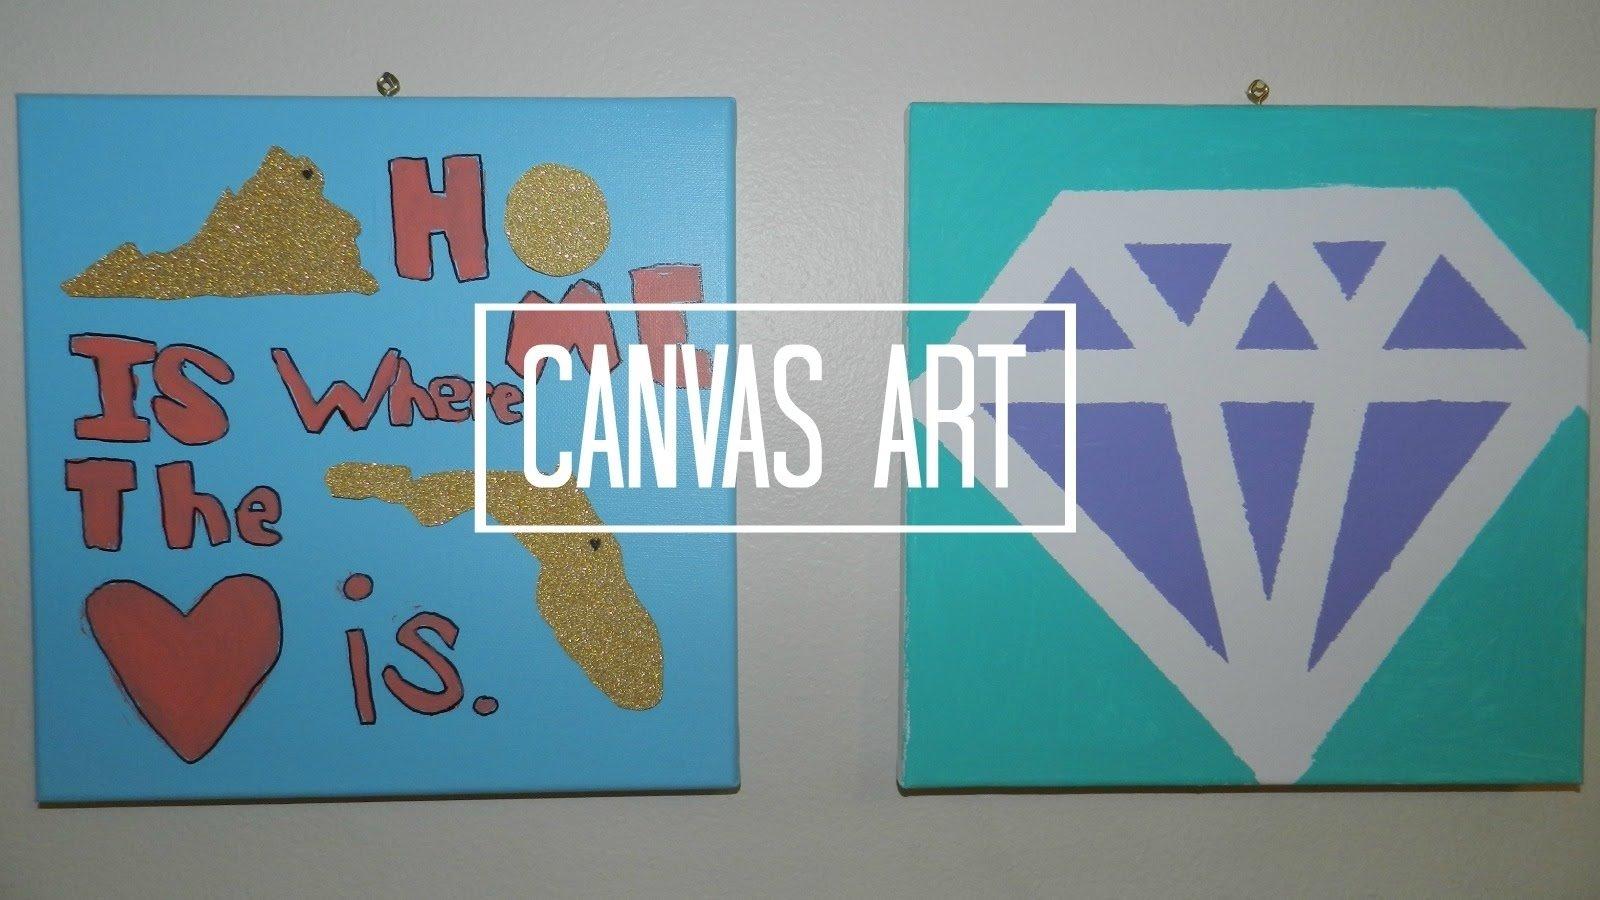 10 Stylish Easy Diy Canvas Painting Ideas simple canvas art beginners tierra este 12337 2 2020